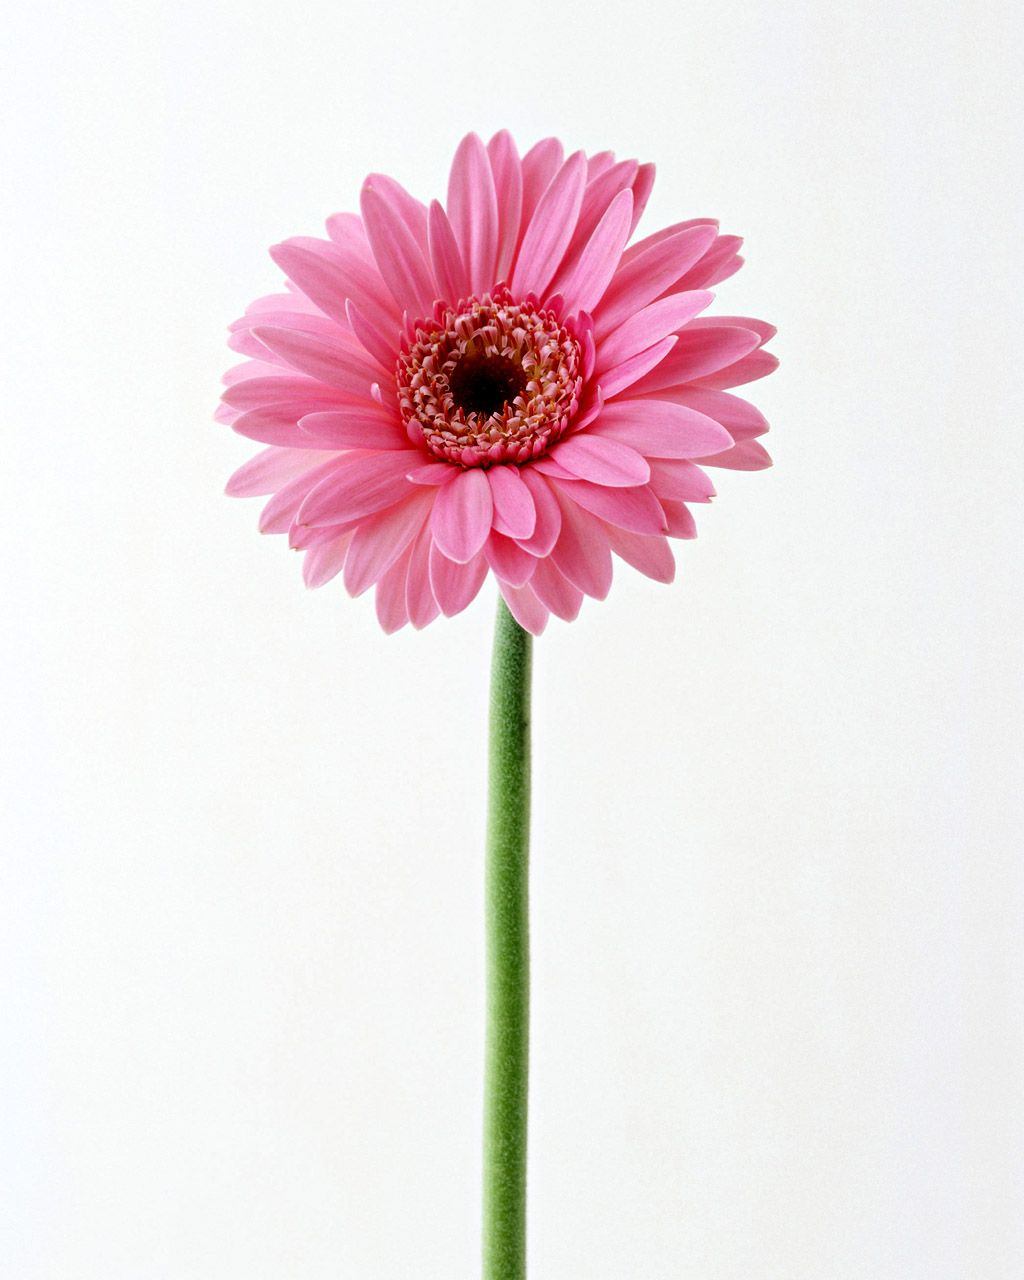 15 Vertical Flower Wallpapers